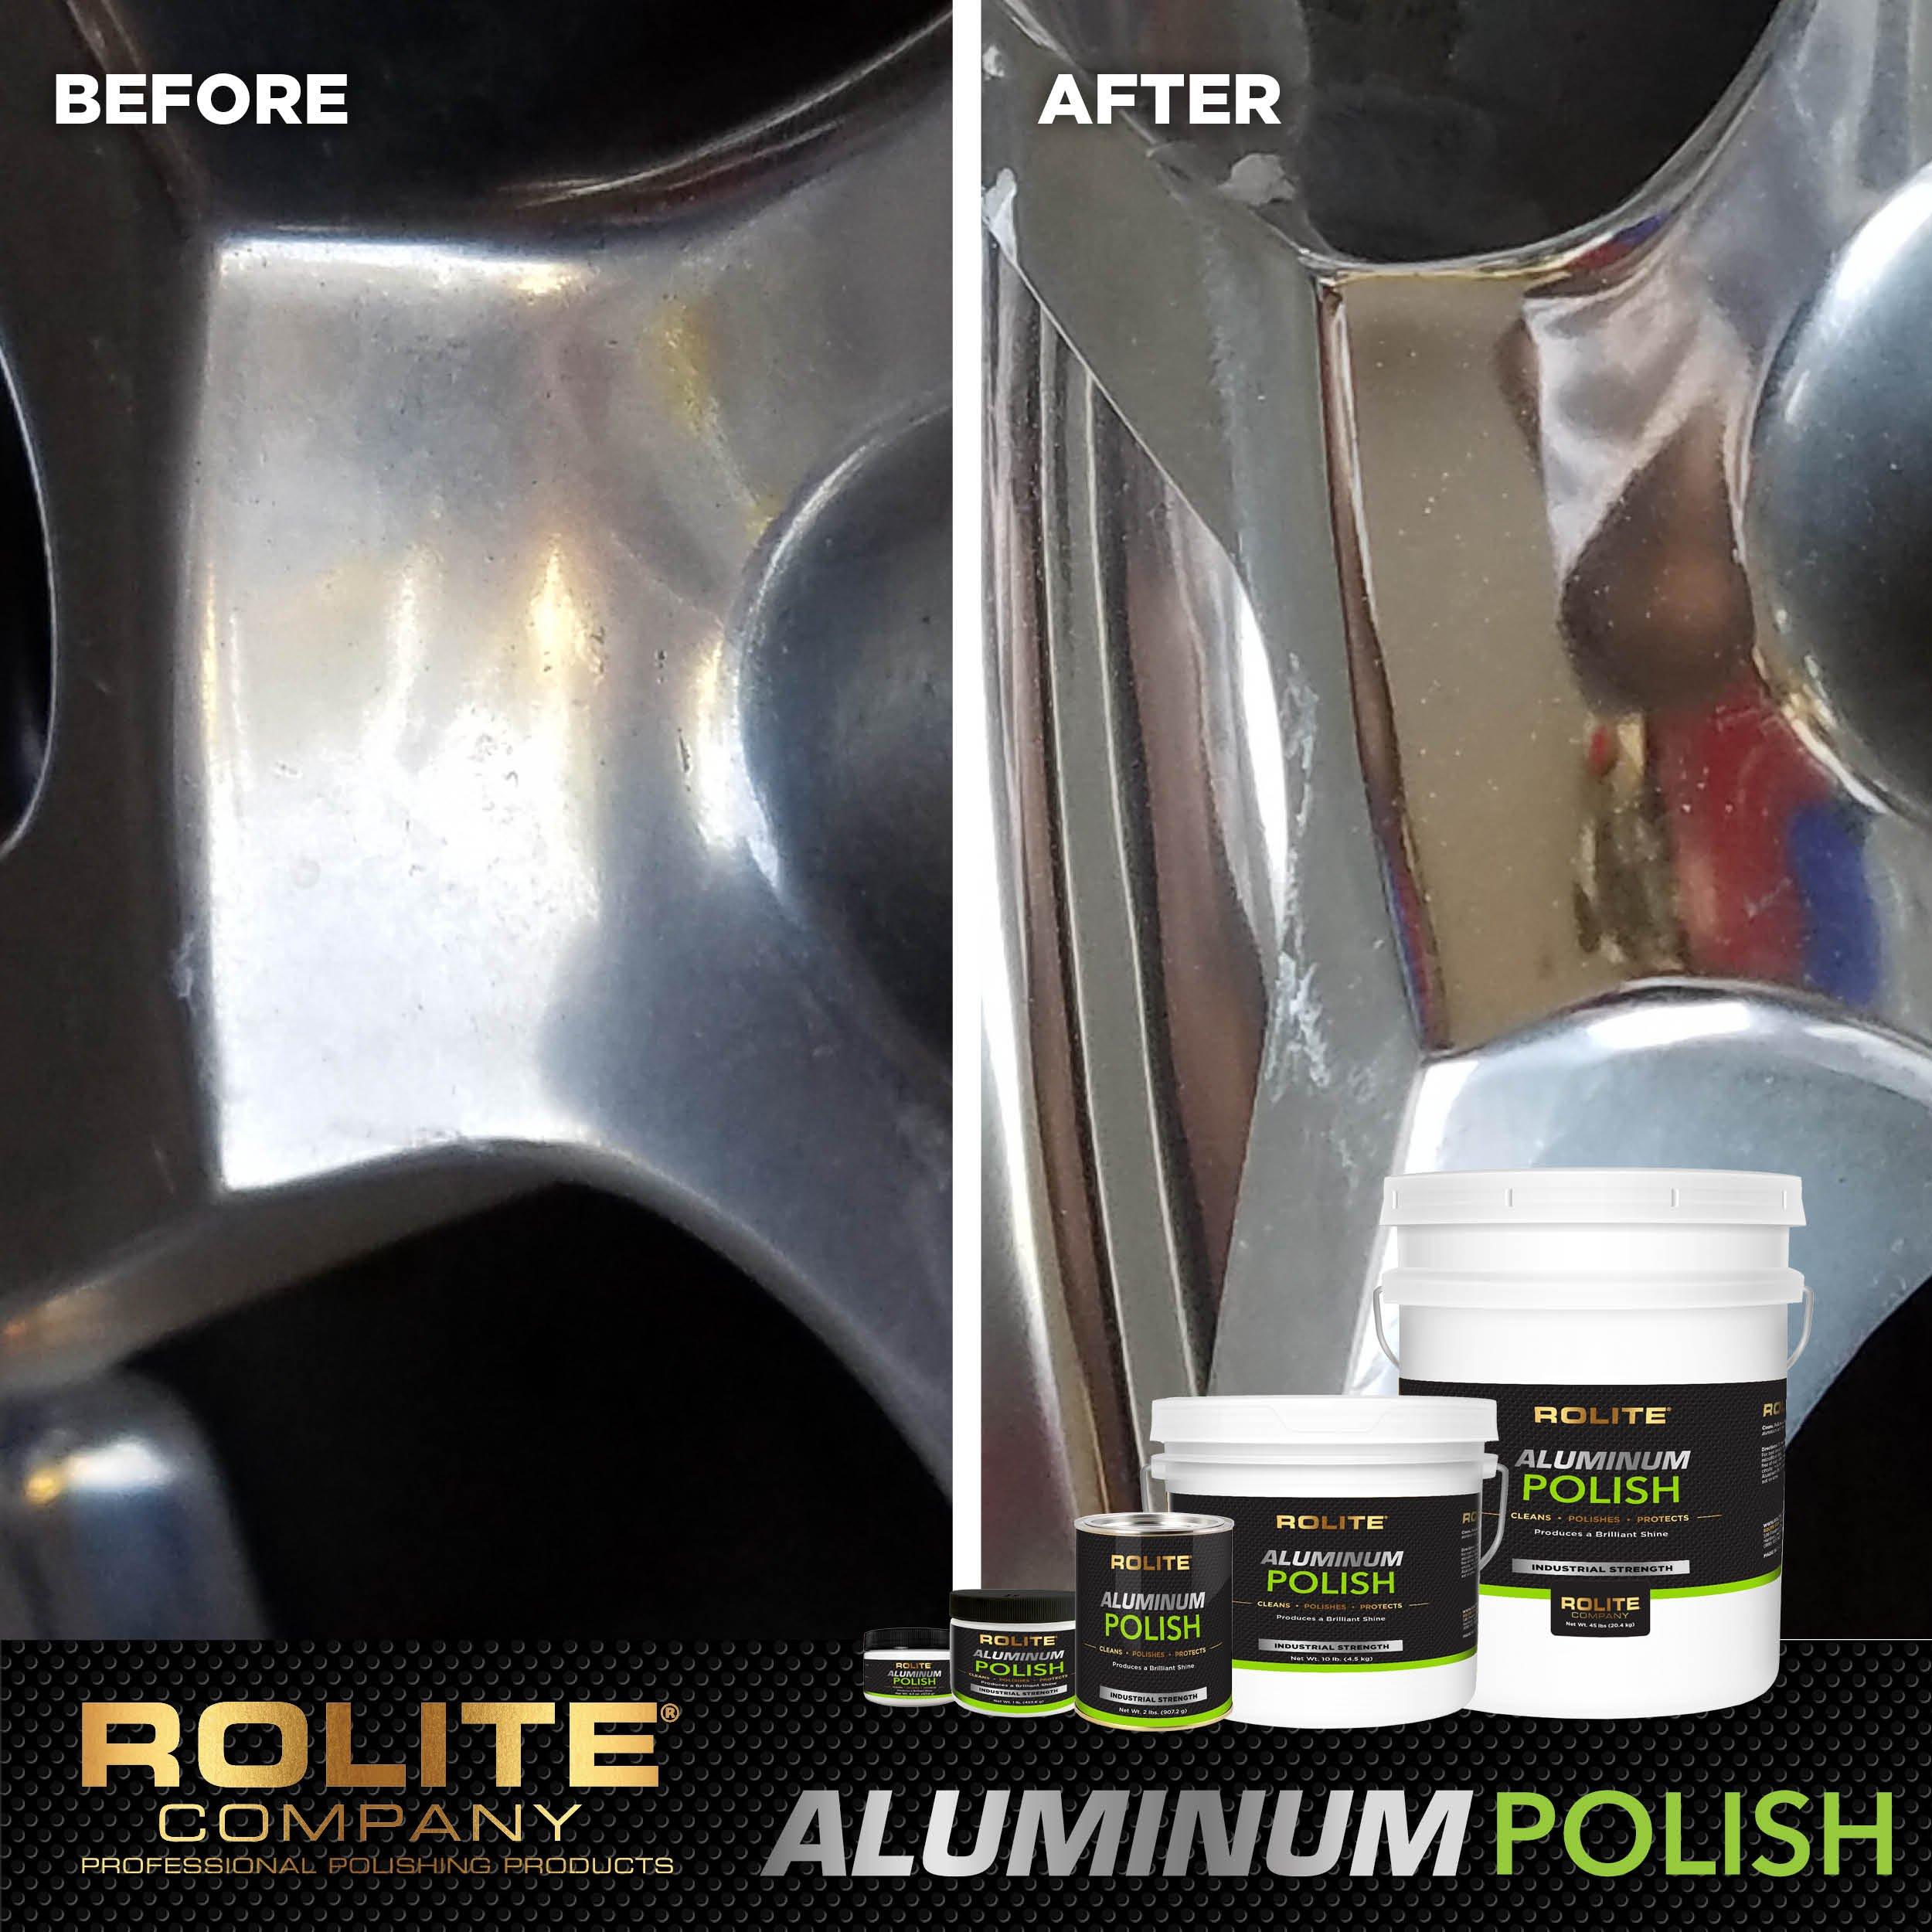 Rolite Aluminum Polish (1lb) for All Aluminum & Bare Metal Surfaces, Canoes, Jon Boats, Pontoons, Diamond Plate, Aluminum Non-Coated Wheels 6 Pack by Rolite (Image #6)